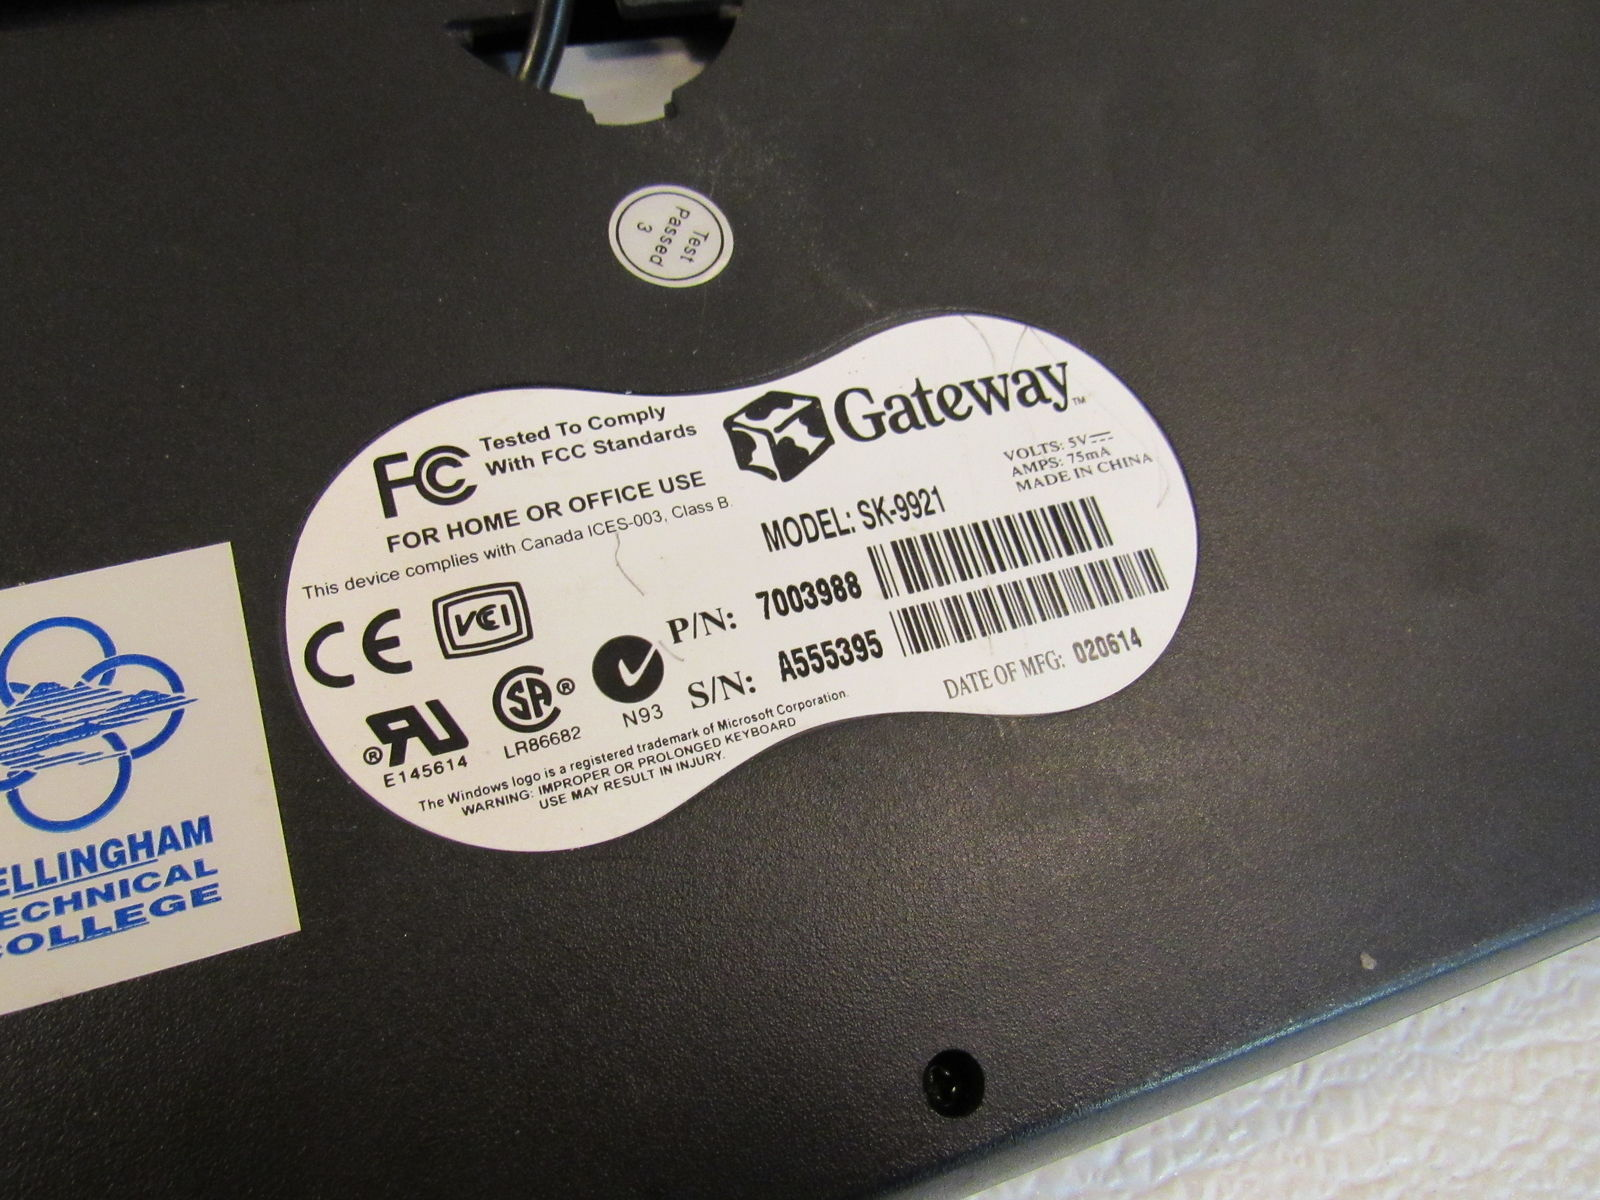 Gateway Desktop Wired Keyboard PS2 Black/Gray 104 Keys Genuine/OEM SK-9921